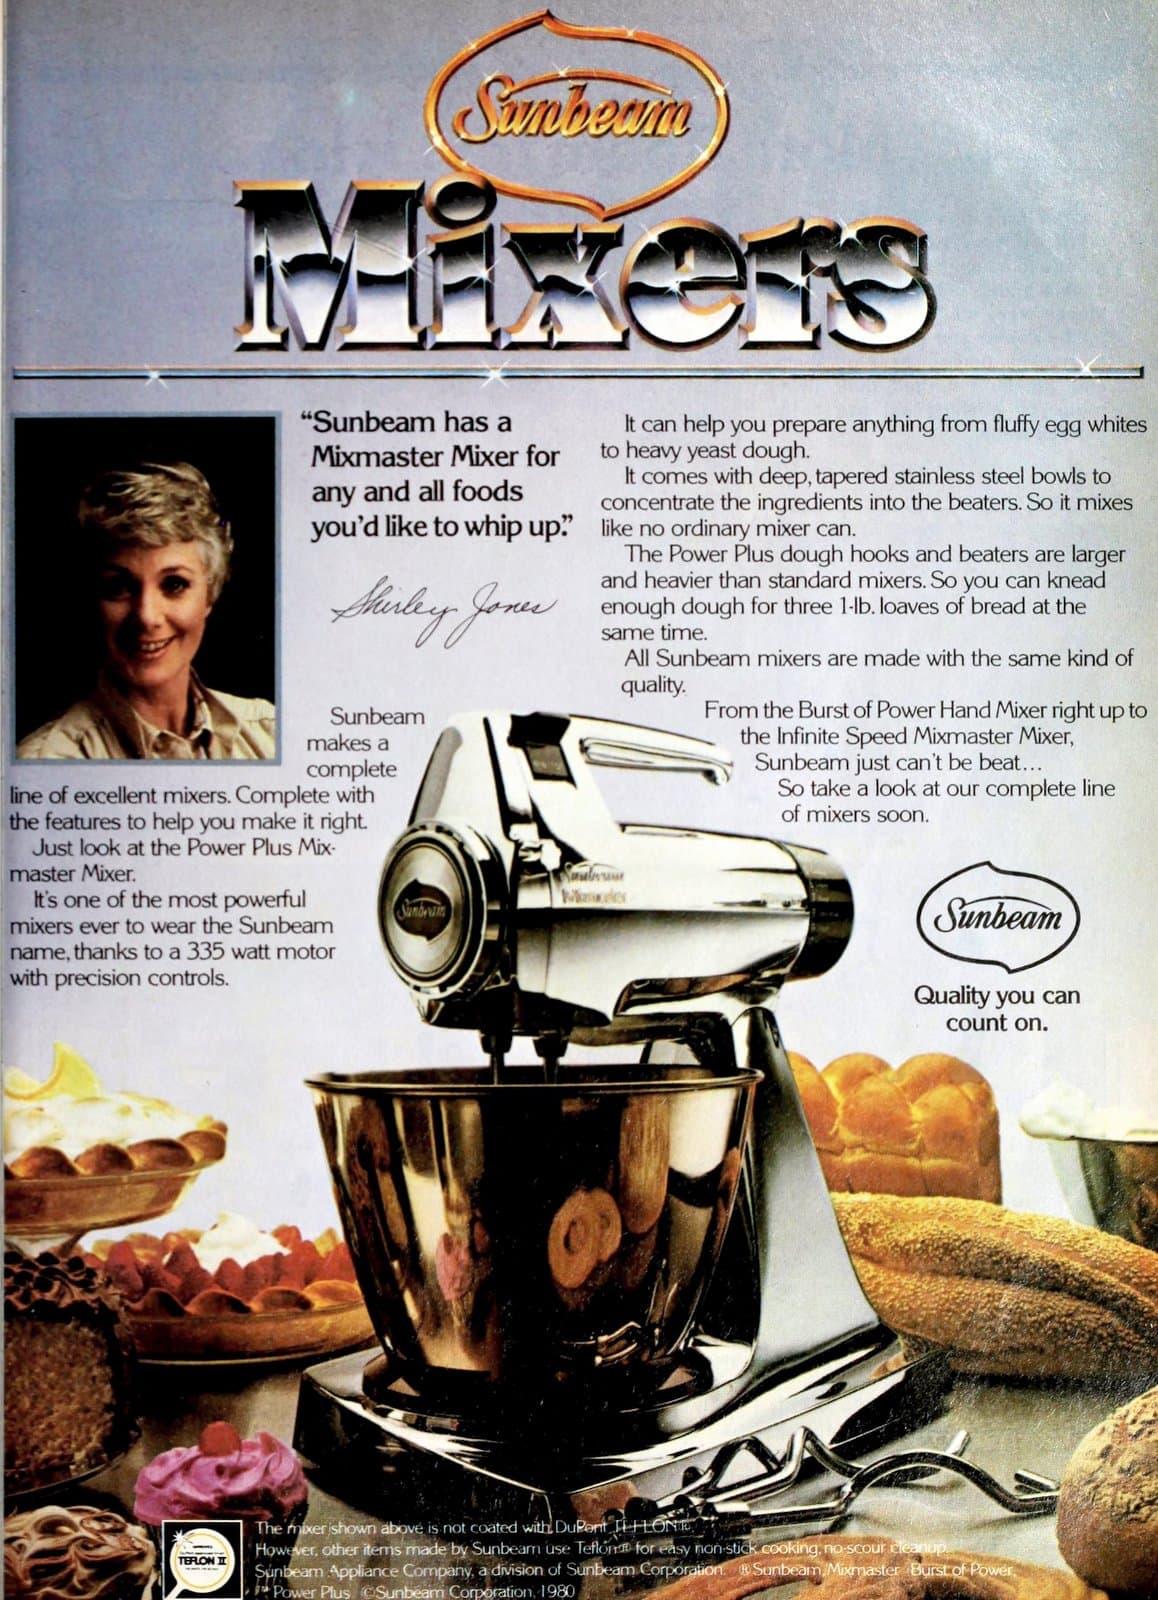 Vintage Sunbeam Mixmaster mixer (1980)